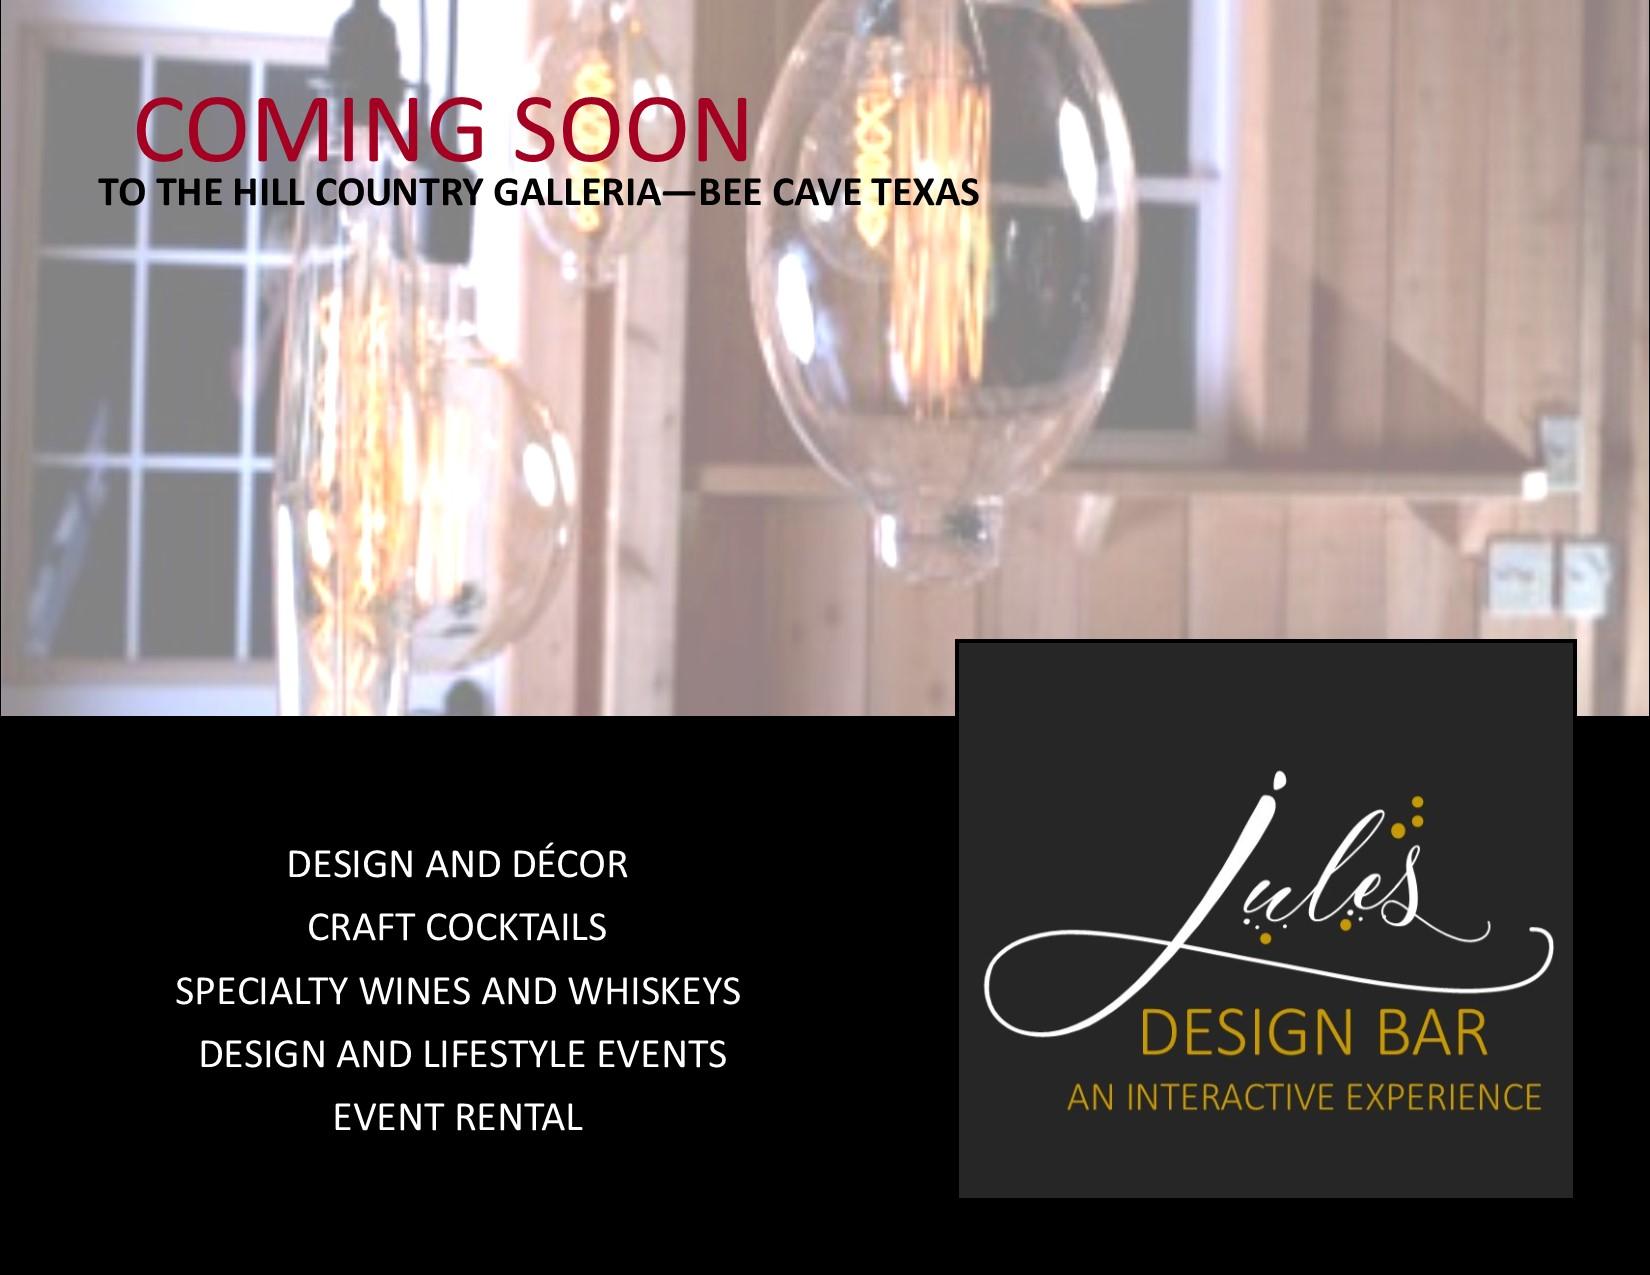 Jules Design Bar